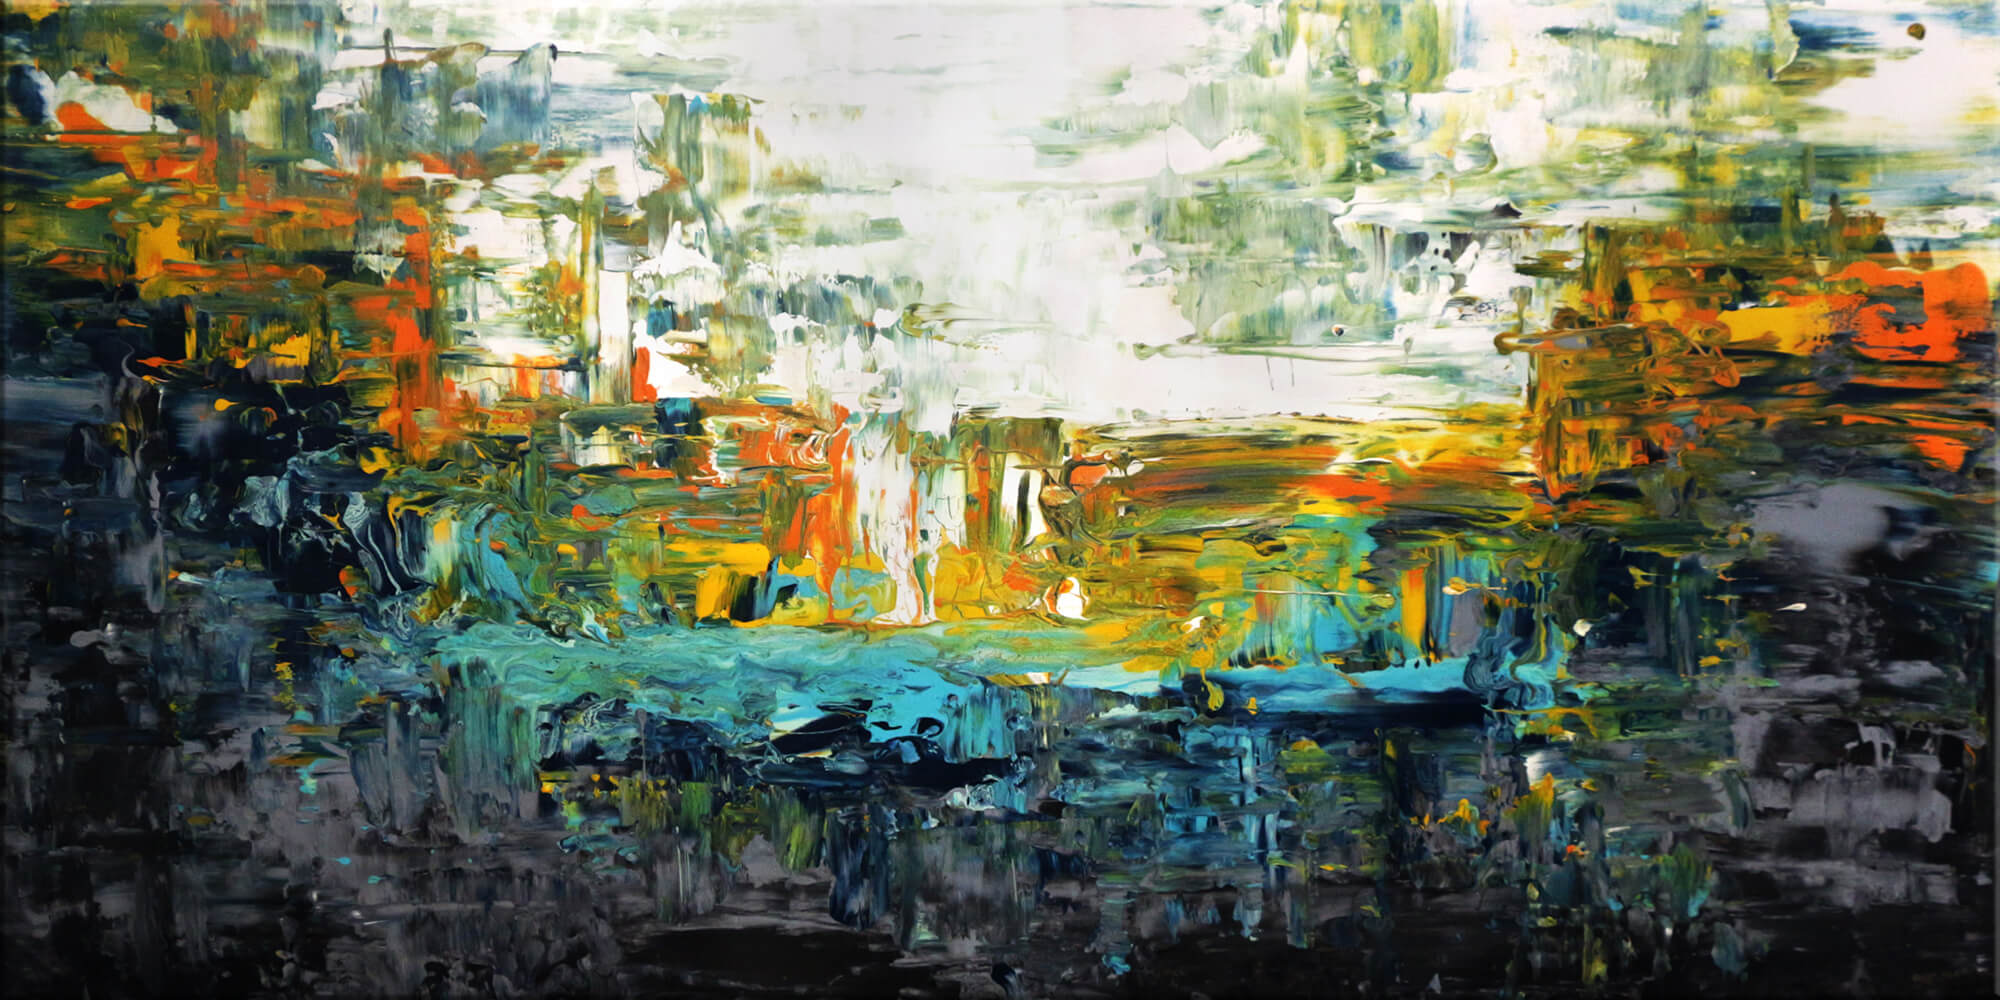 Original Gemälde von Noah de Jong Magischer Fluss